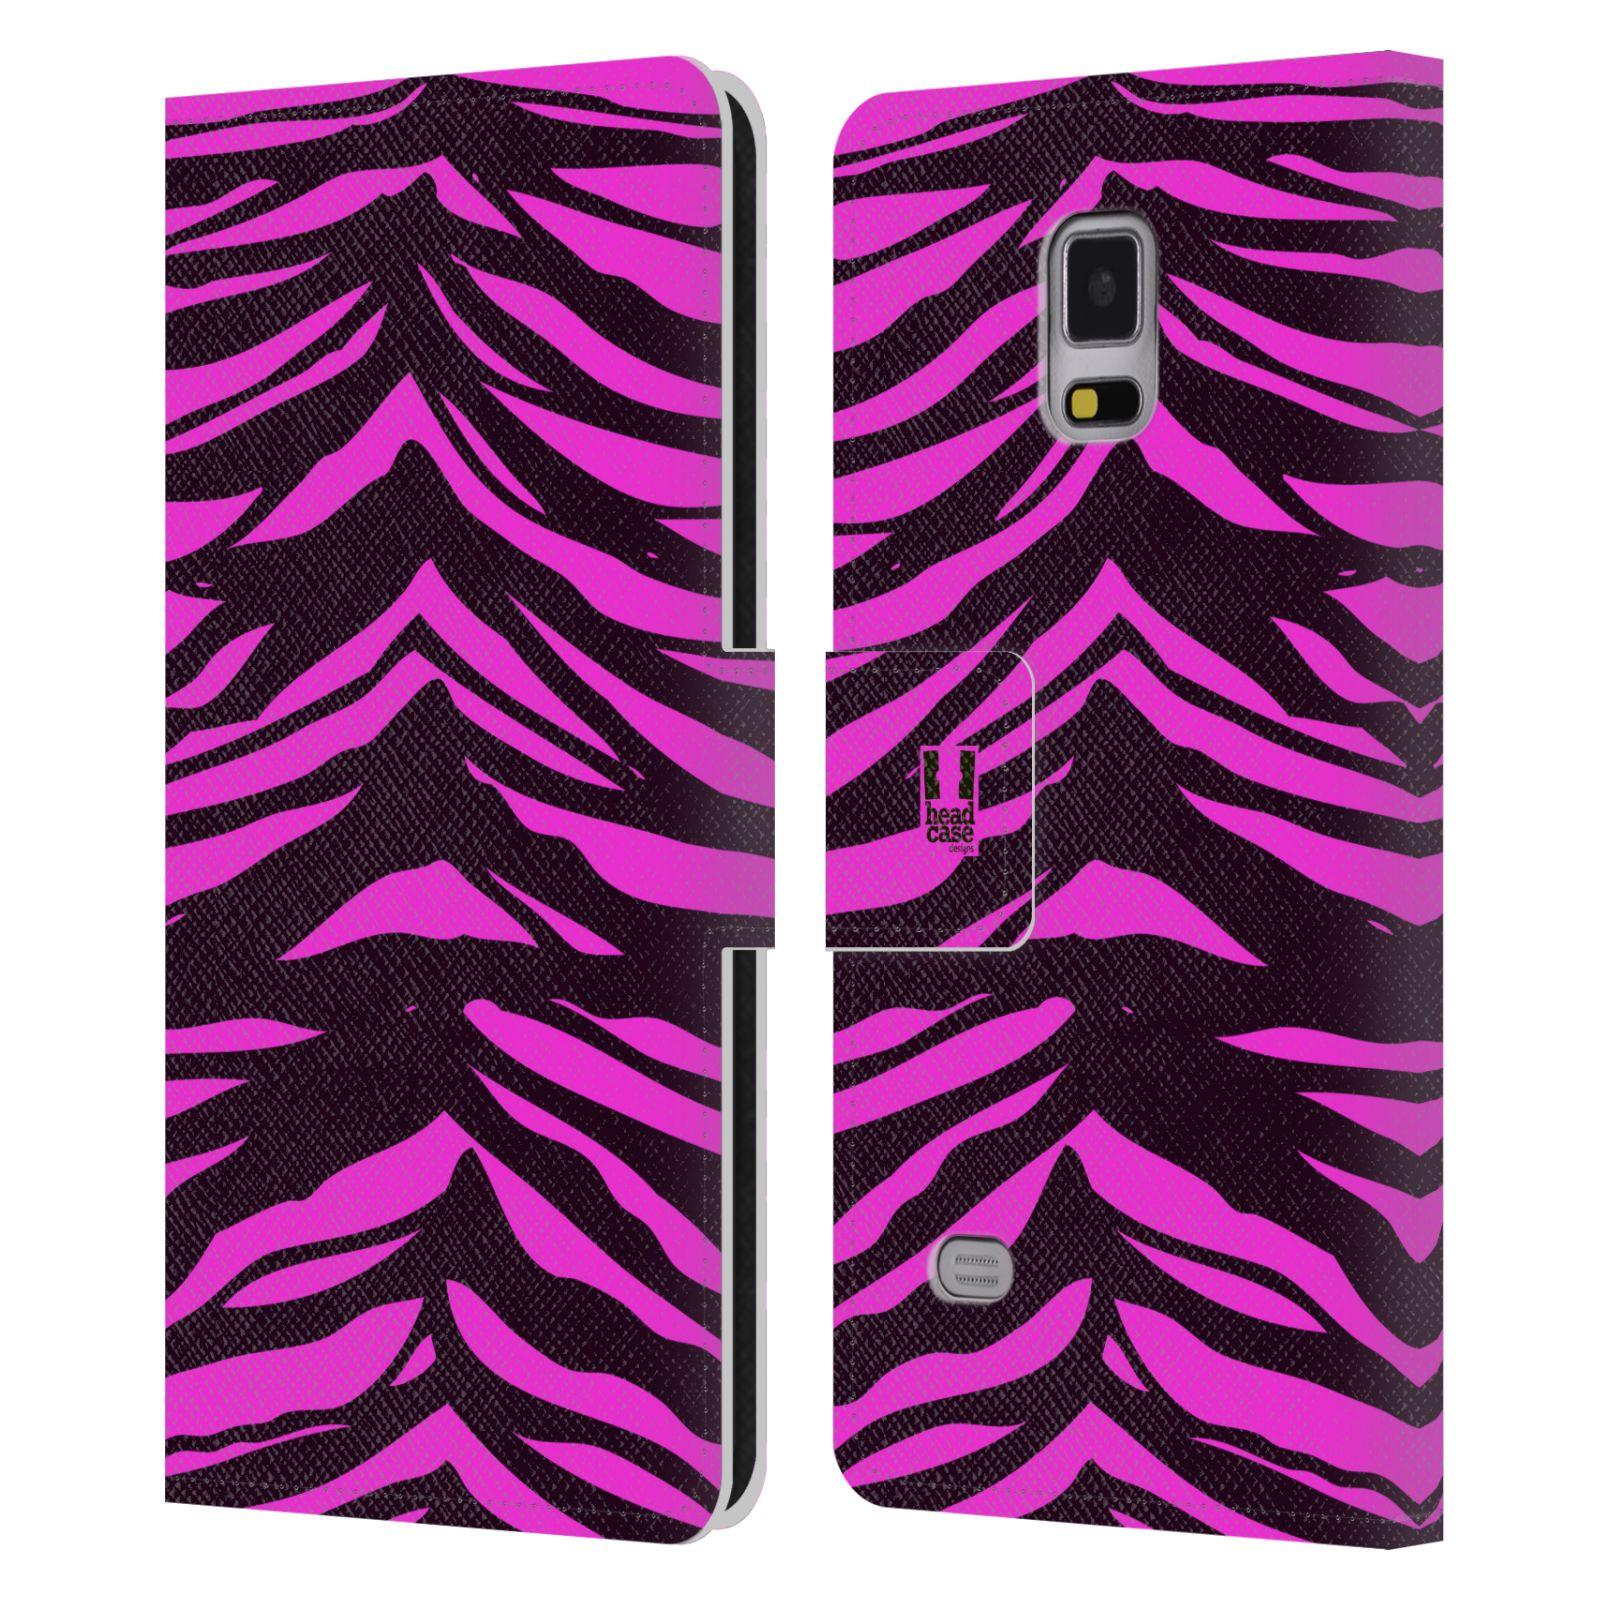 HEAD CASE Flipové pouzdro pro mobil Samsung Galaxy Note 4 Zvířecí barevné vzory fialová tygr